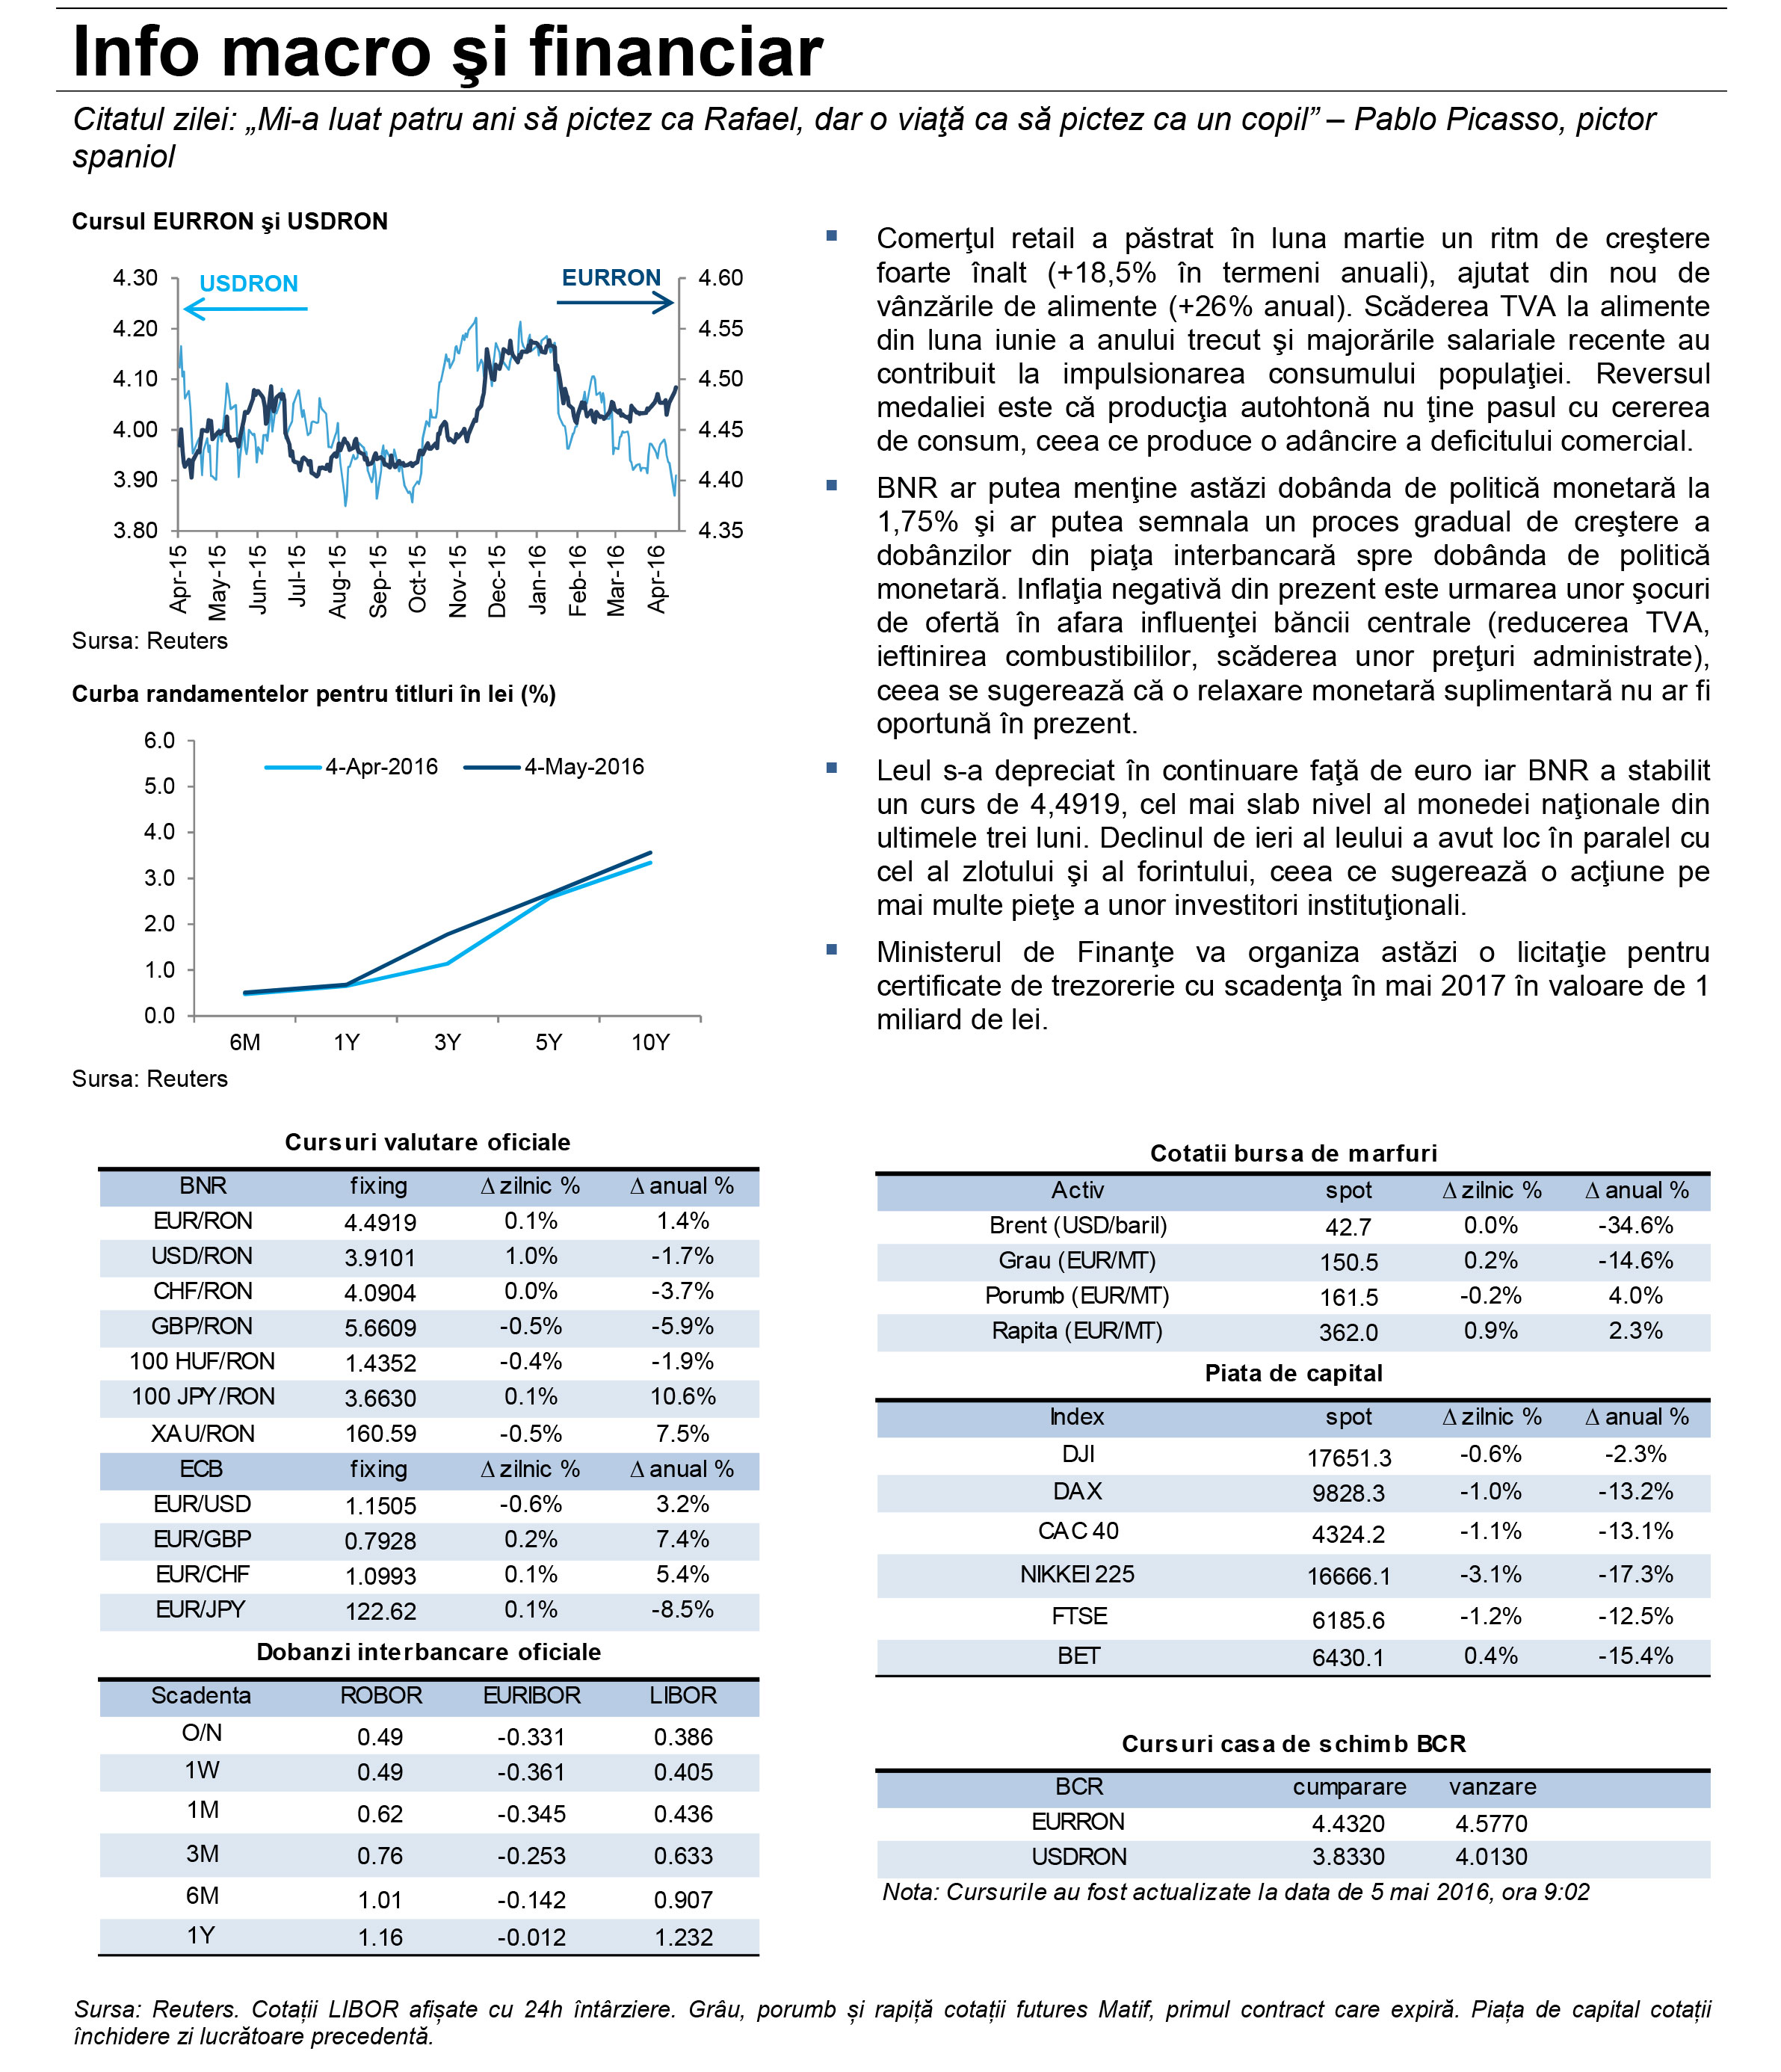 Trezorerie-curs-valutar-profil-economic